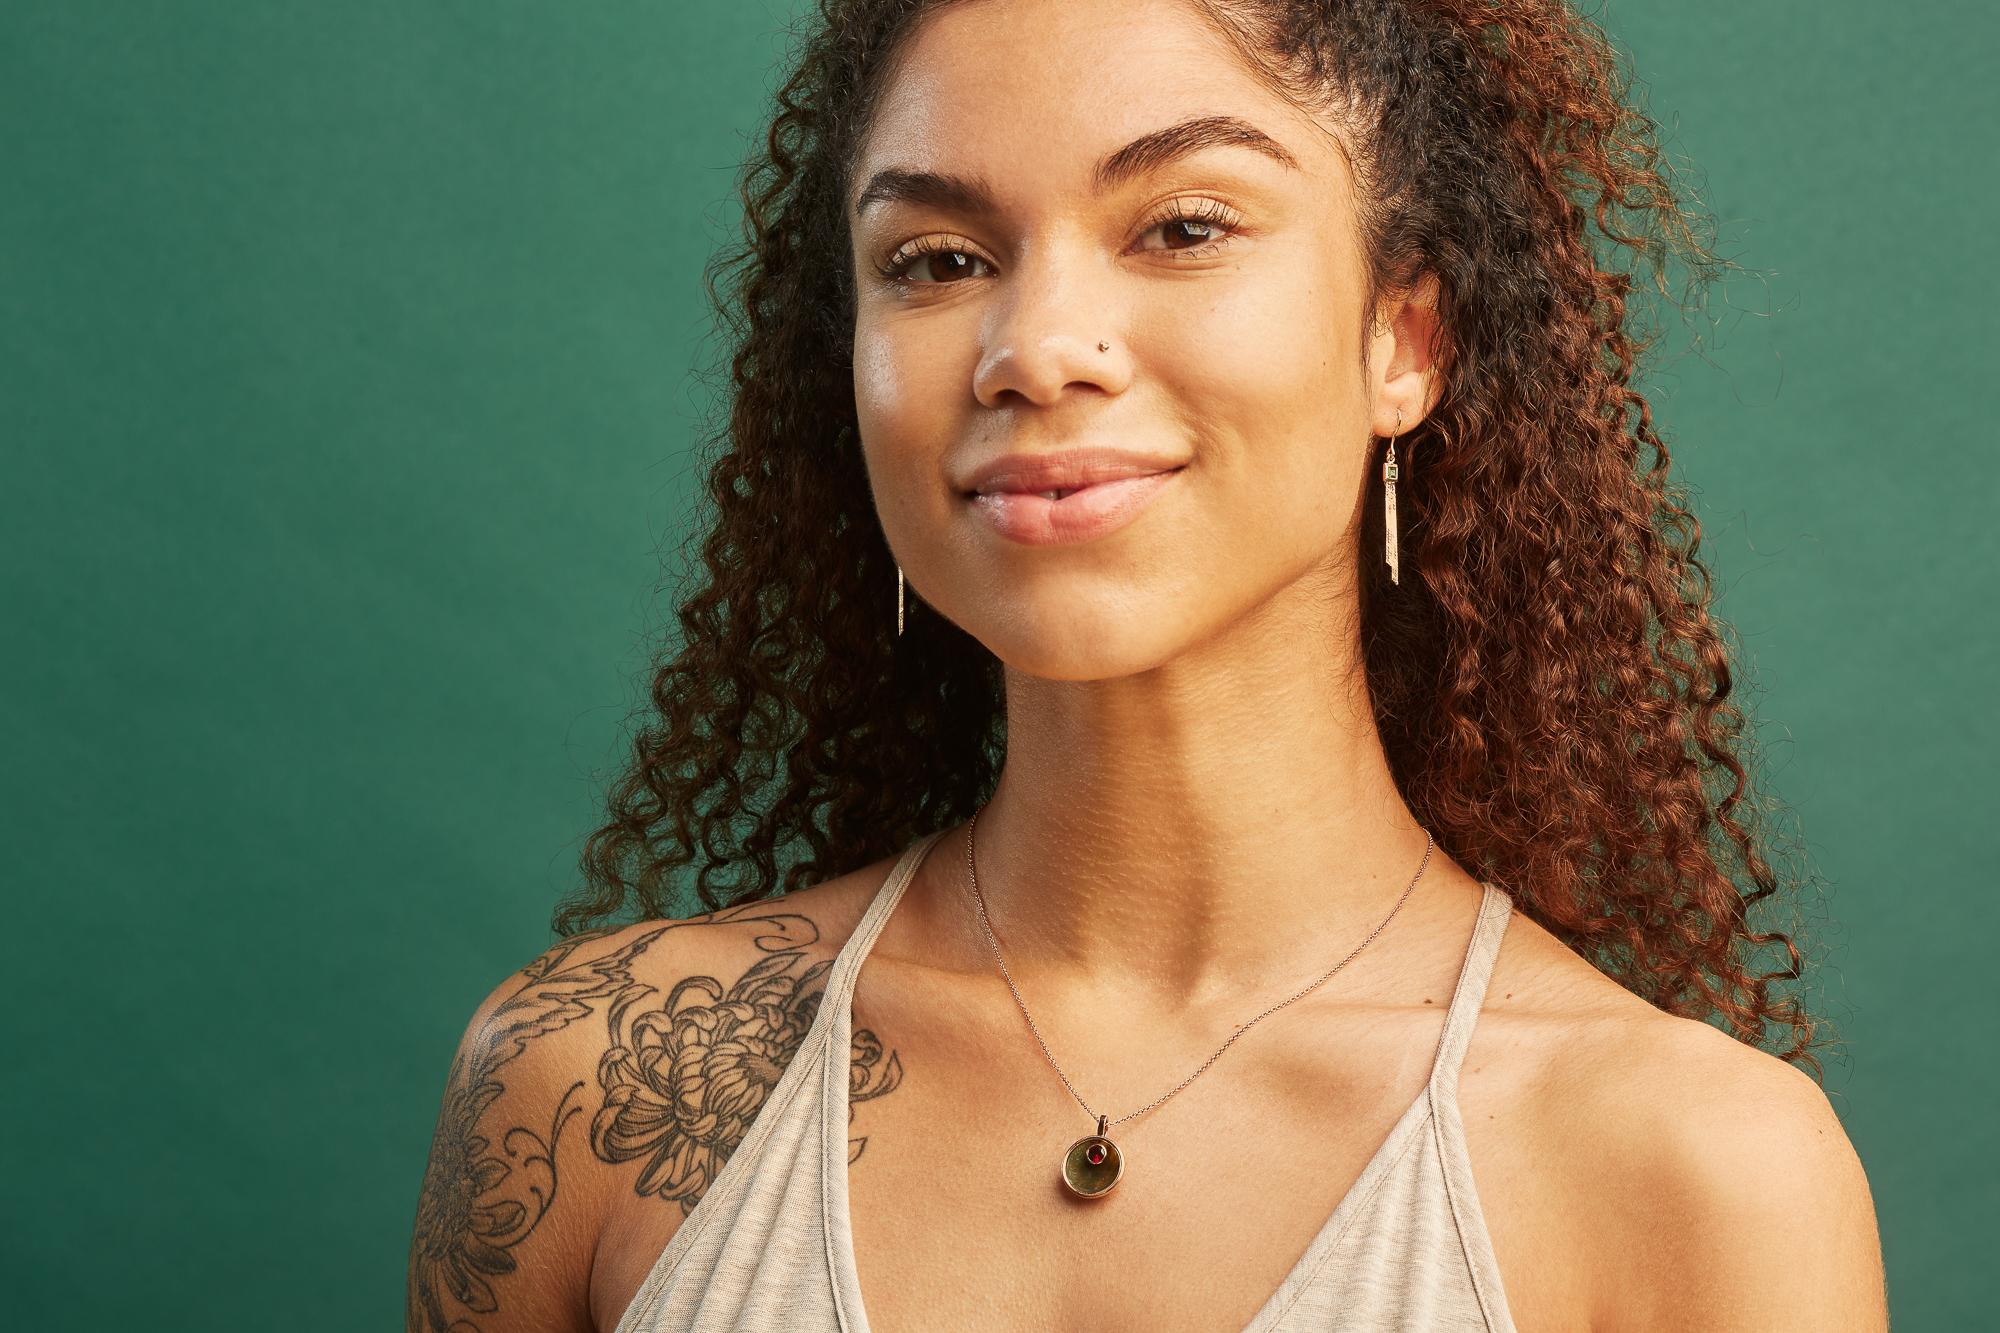 Alyssa Jade modeling Mercurius jewelry in Ella Sophie's Oakland photo studio